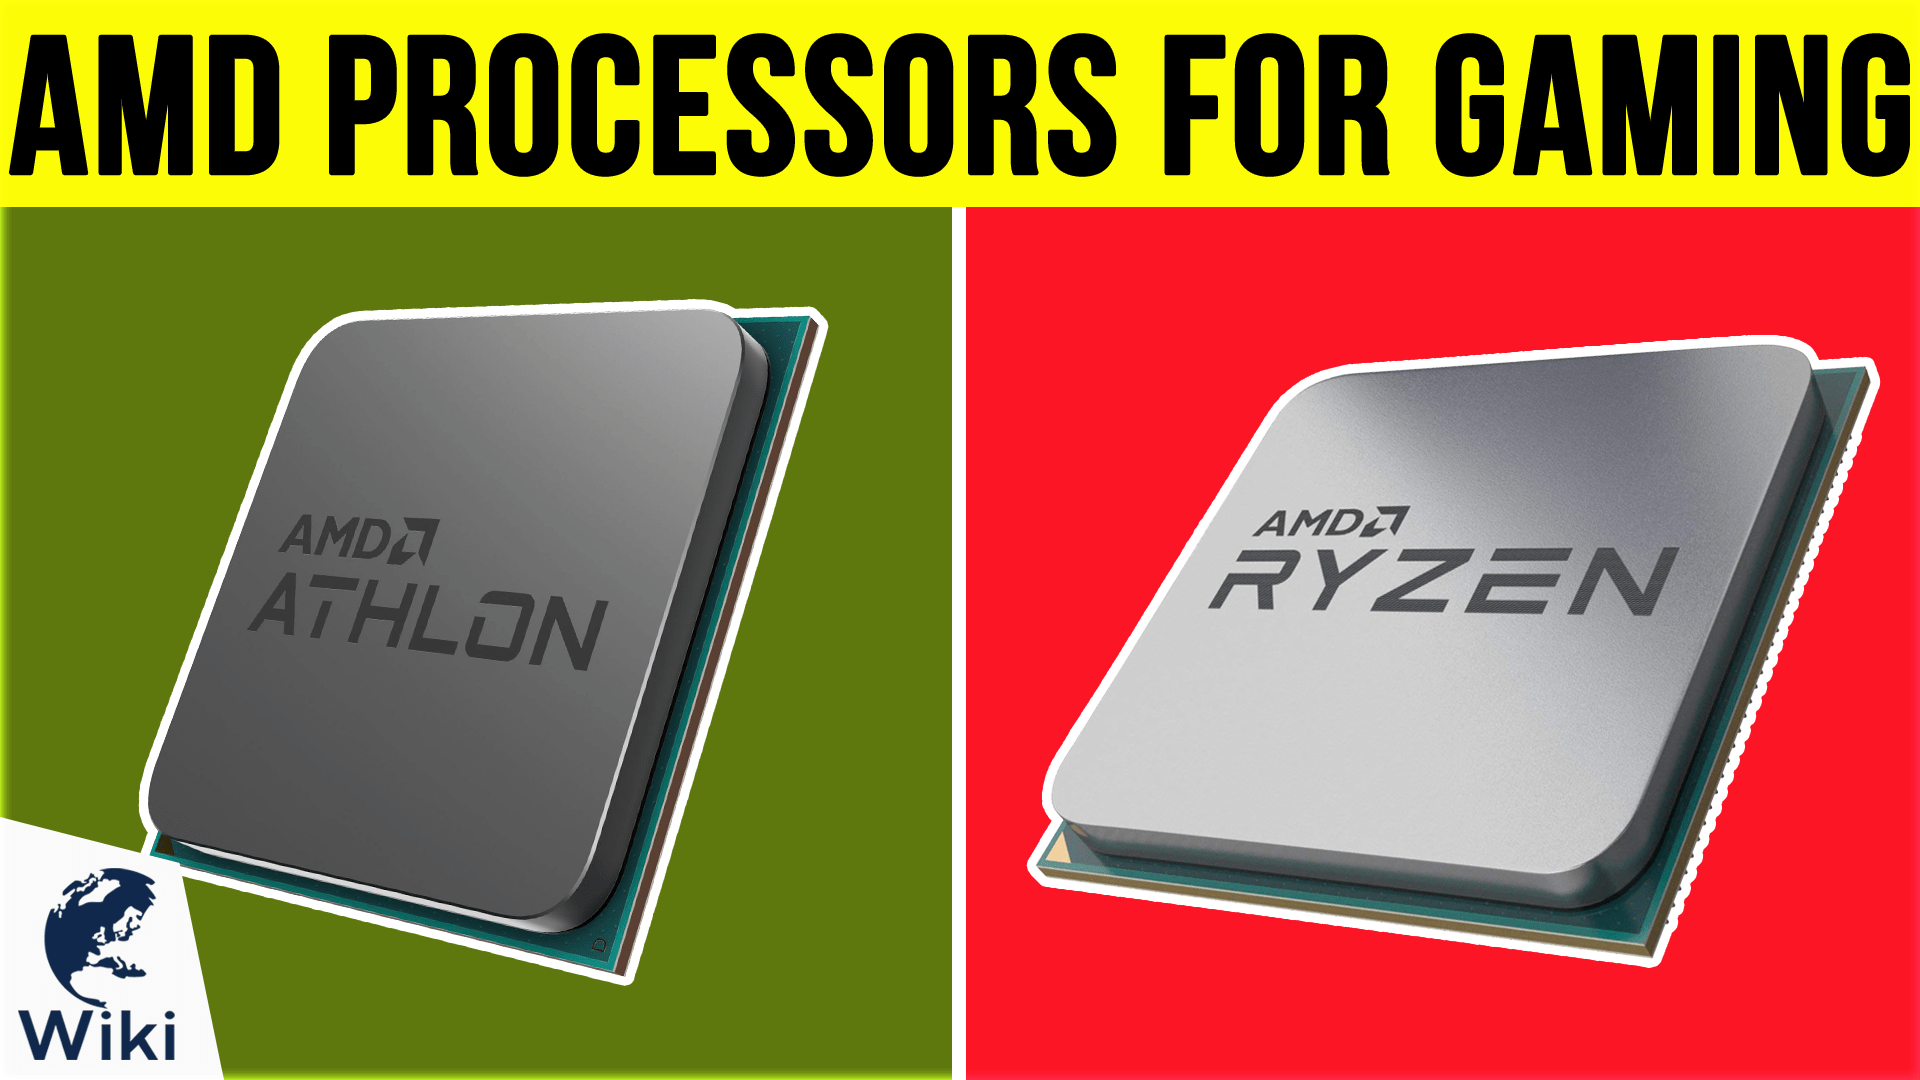 Retail AD245EHDGMBOX AMD Athlon II X2 245E Energy Efficient Regor 2.9 GHz 2x1MB L2 Cache Socket AM3 45W Dual-Core Processor